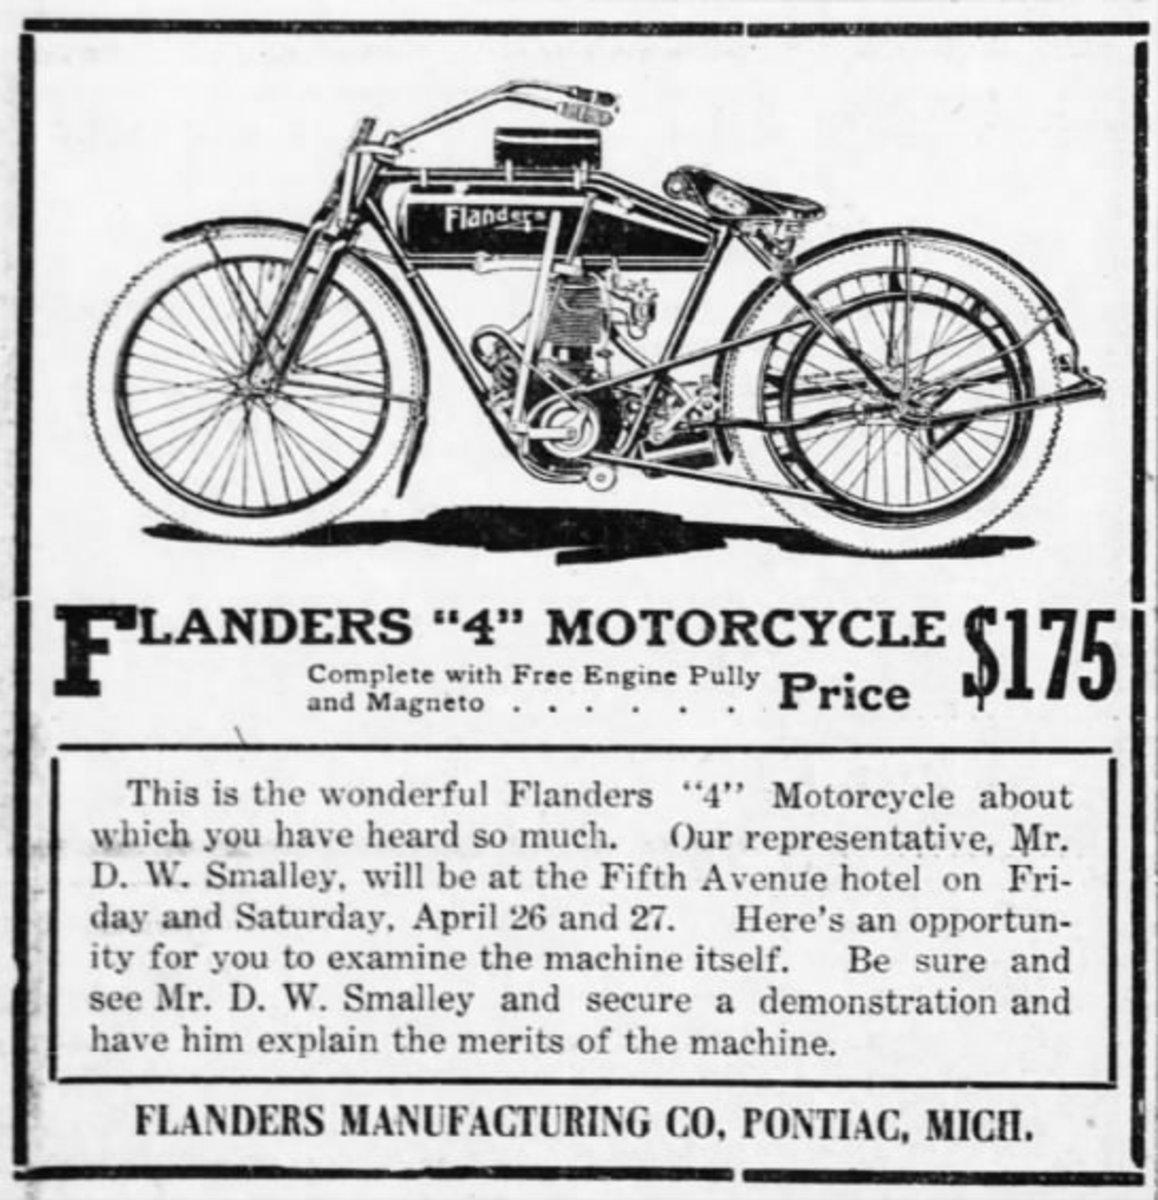 CLIPPED FROM Arkansas City Daily Traveler  Arkansas City, Kansas 25 Apr 1912, Thu  •  Page 6